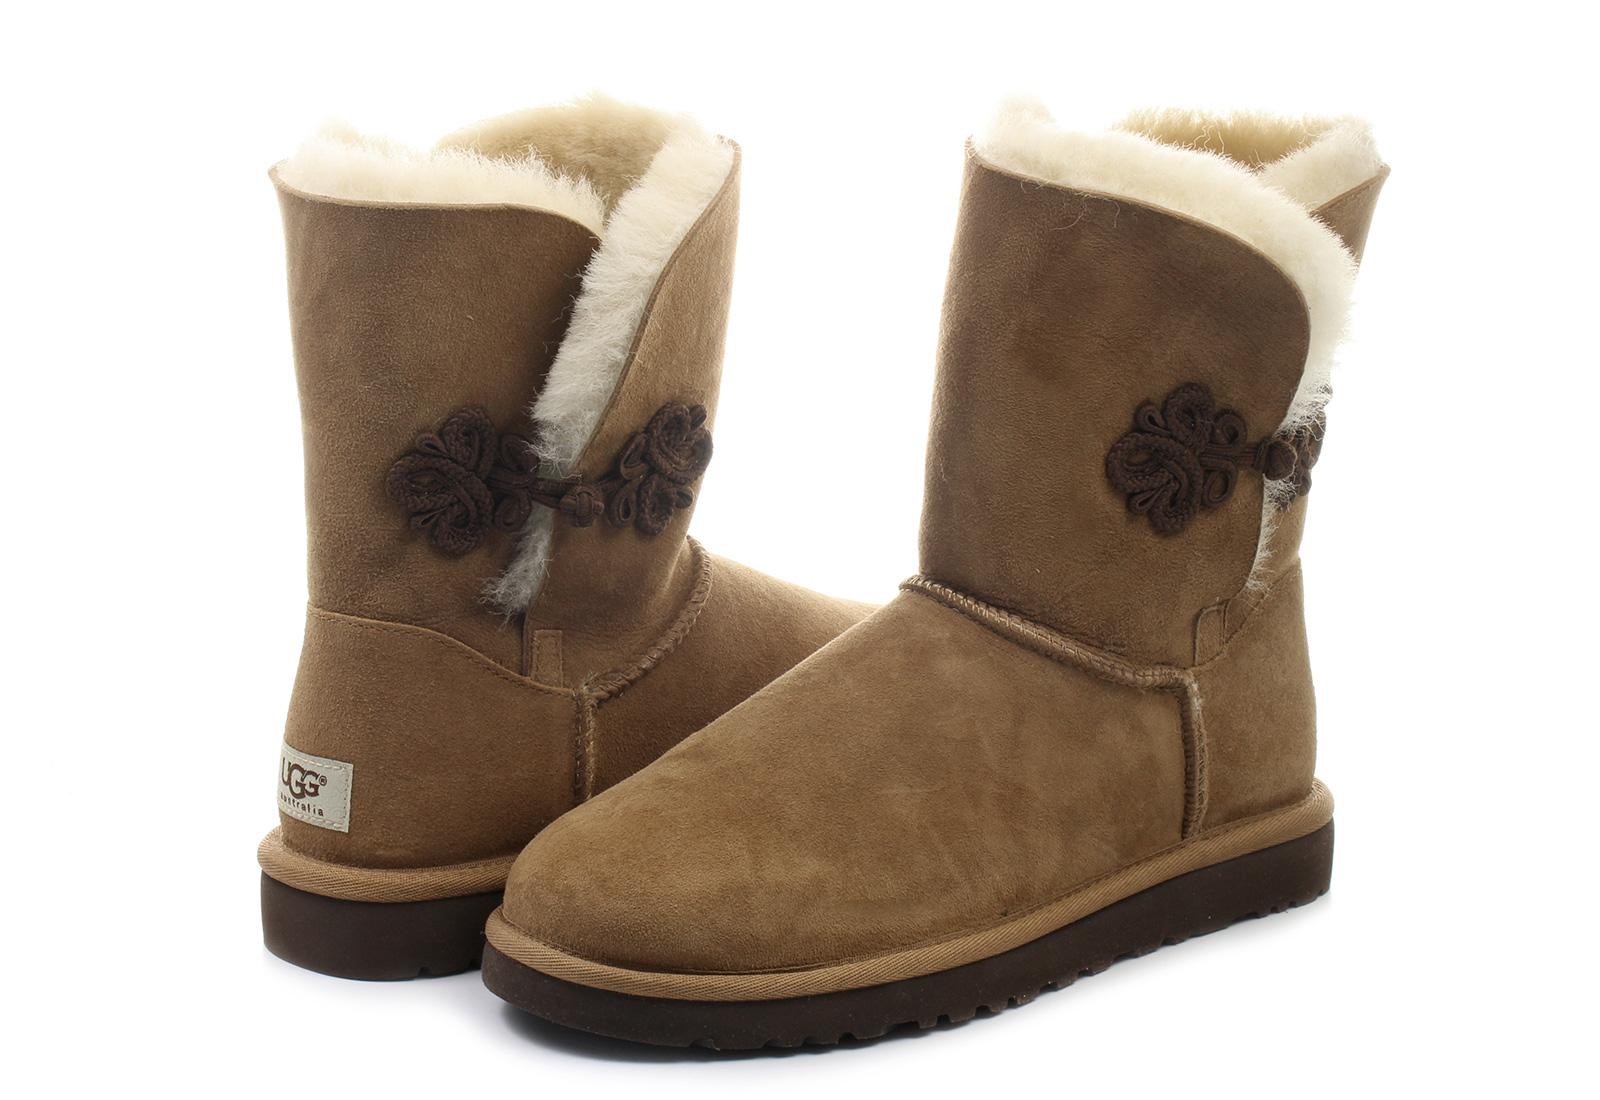 533c717e8df Bailey Uggs Boots - Usefulresults